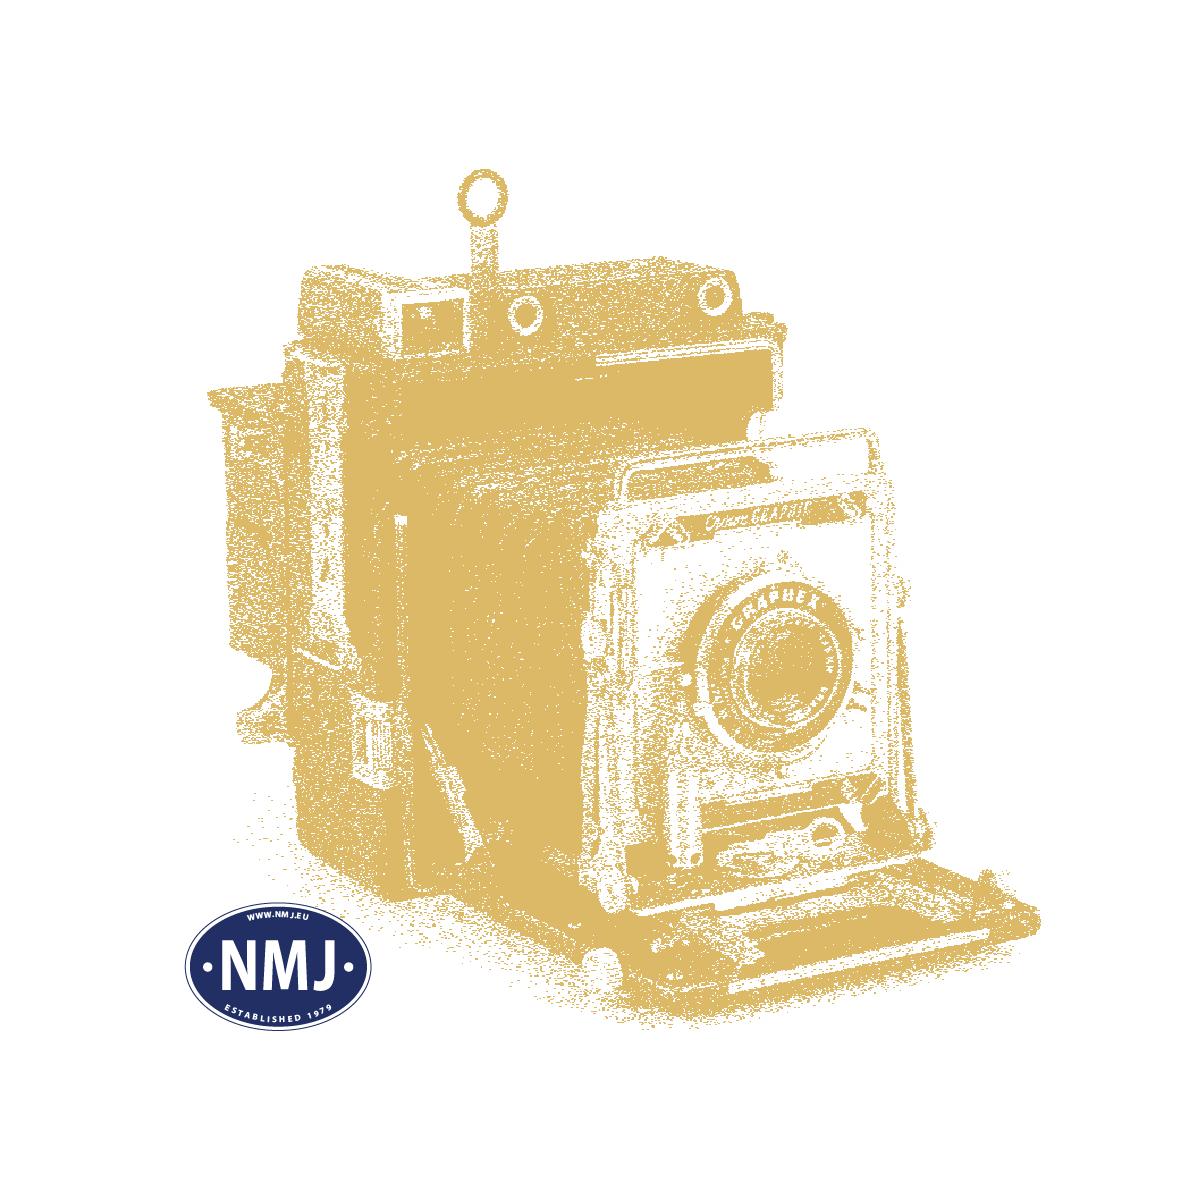 NMJT135.301 - NMJ Topline NSB AB11 24112, 1./2. klasse personvogn, Nydesign